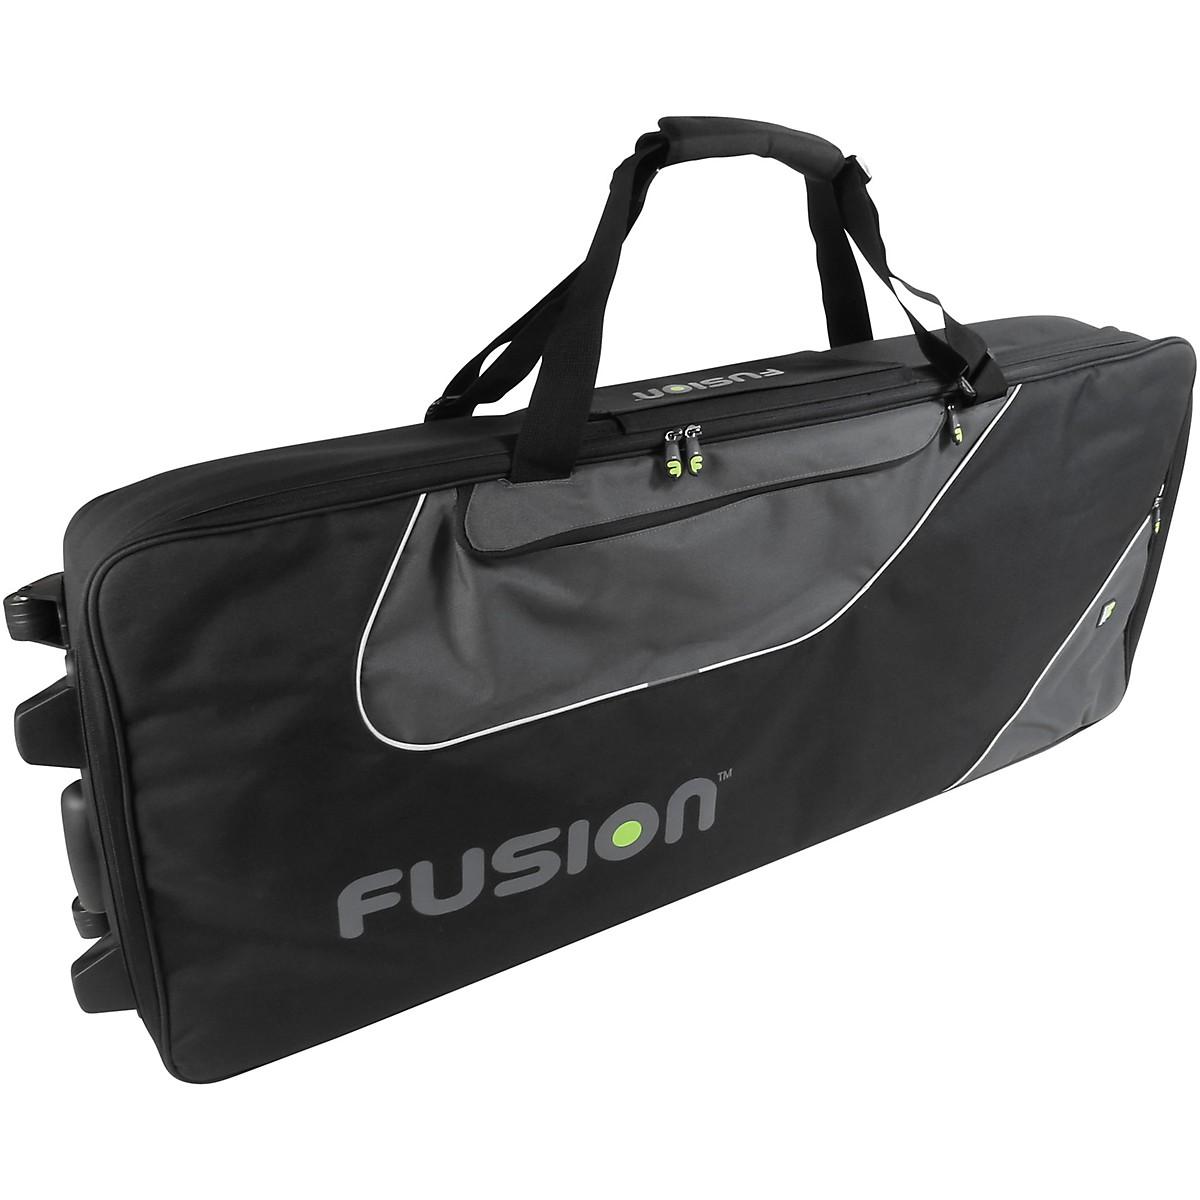 Fusion Keyboard 16 Gig Bag with Wheels (76-88 Keys)